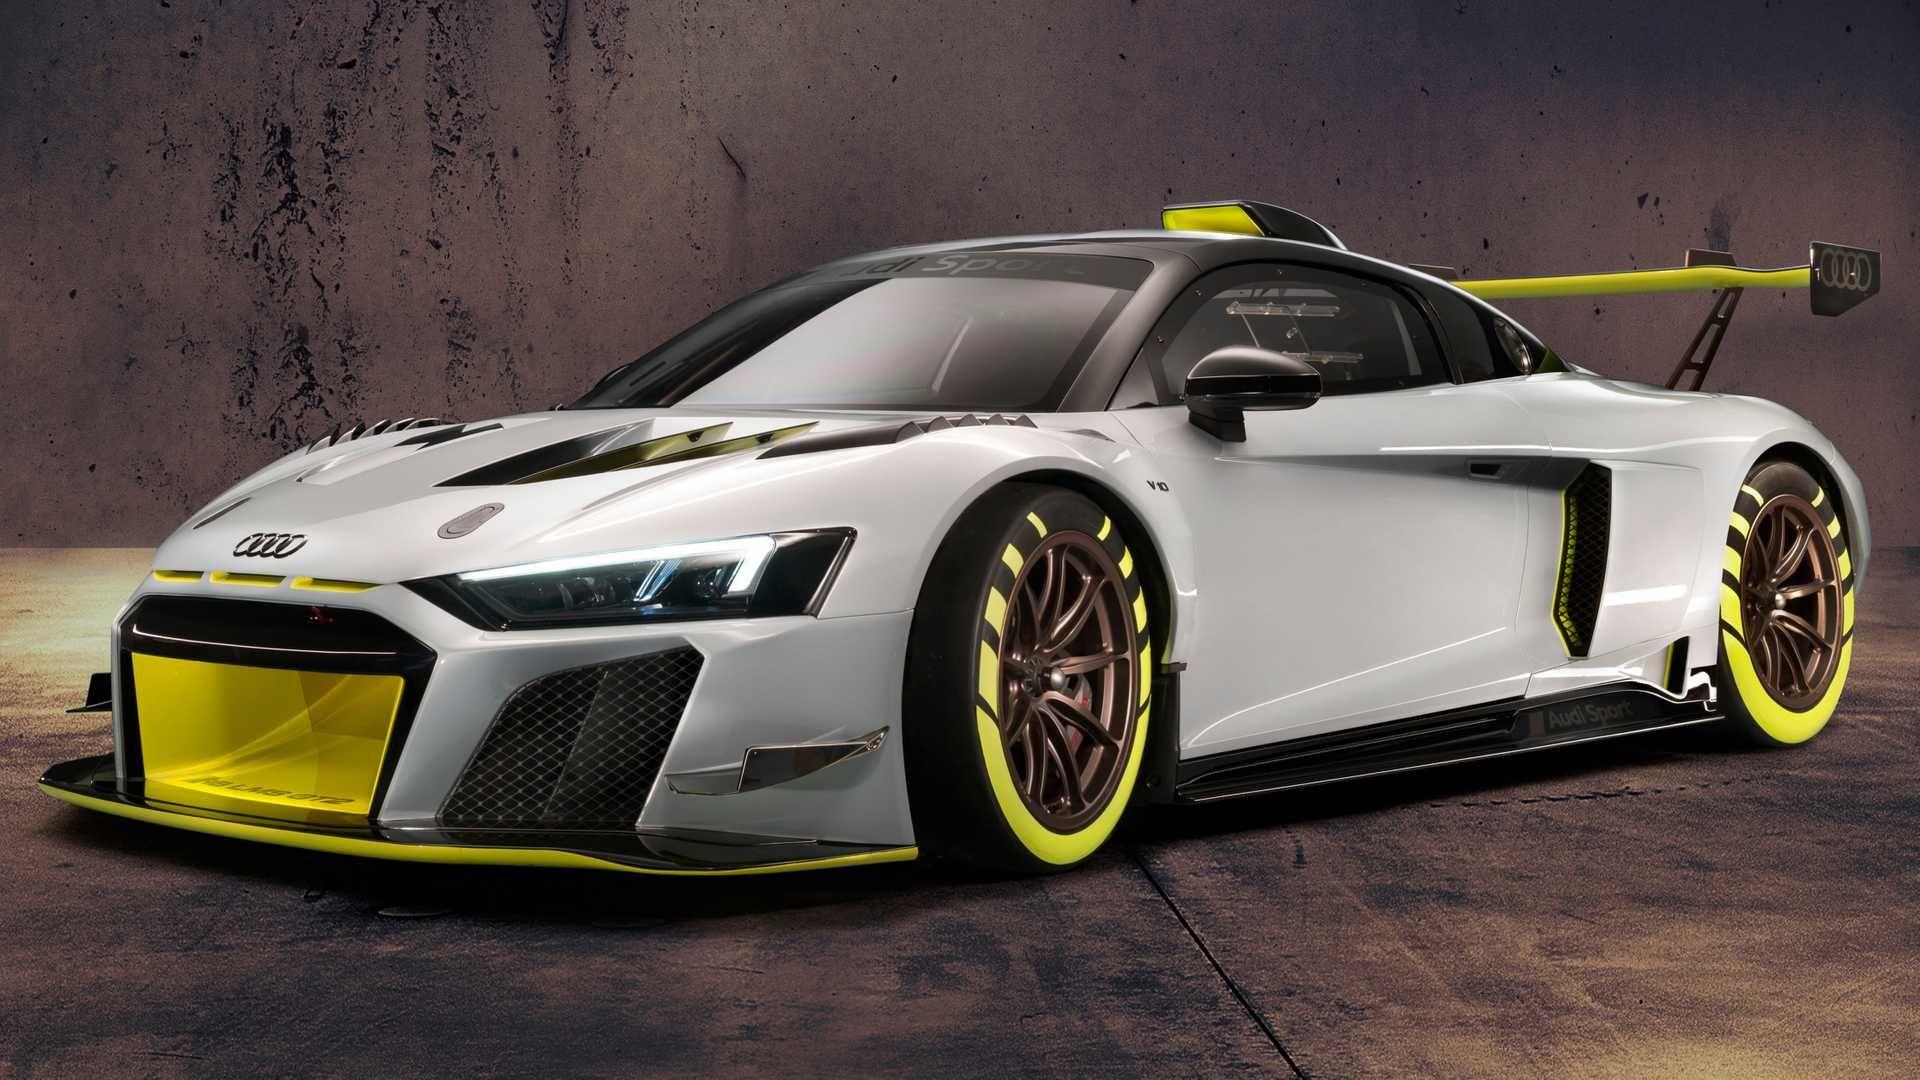 2020 Audi R8 Lms Gt2 Is A Wild Race Car With 630 Hp Race Cars Audi R8 Audi